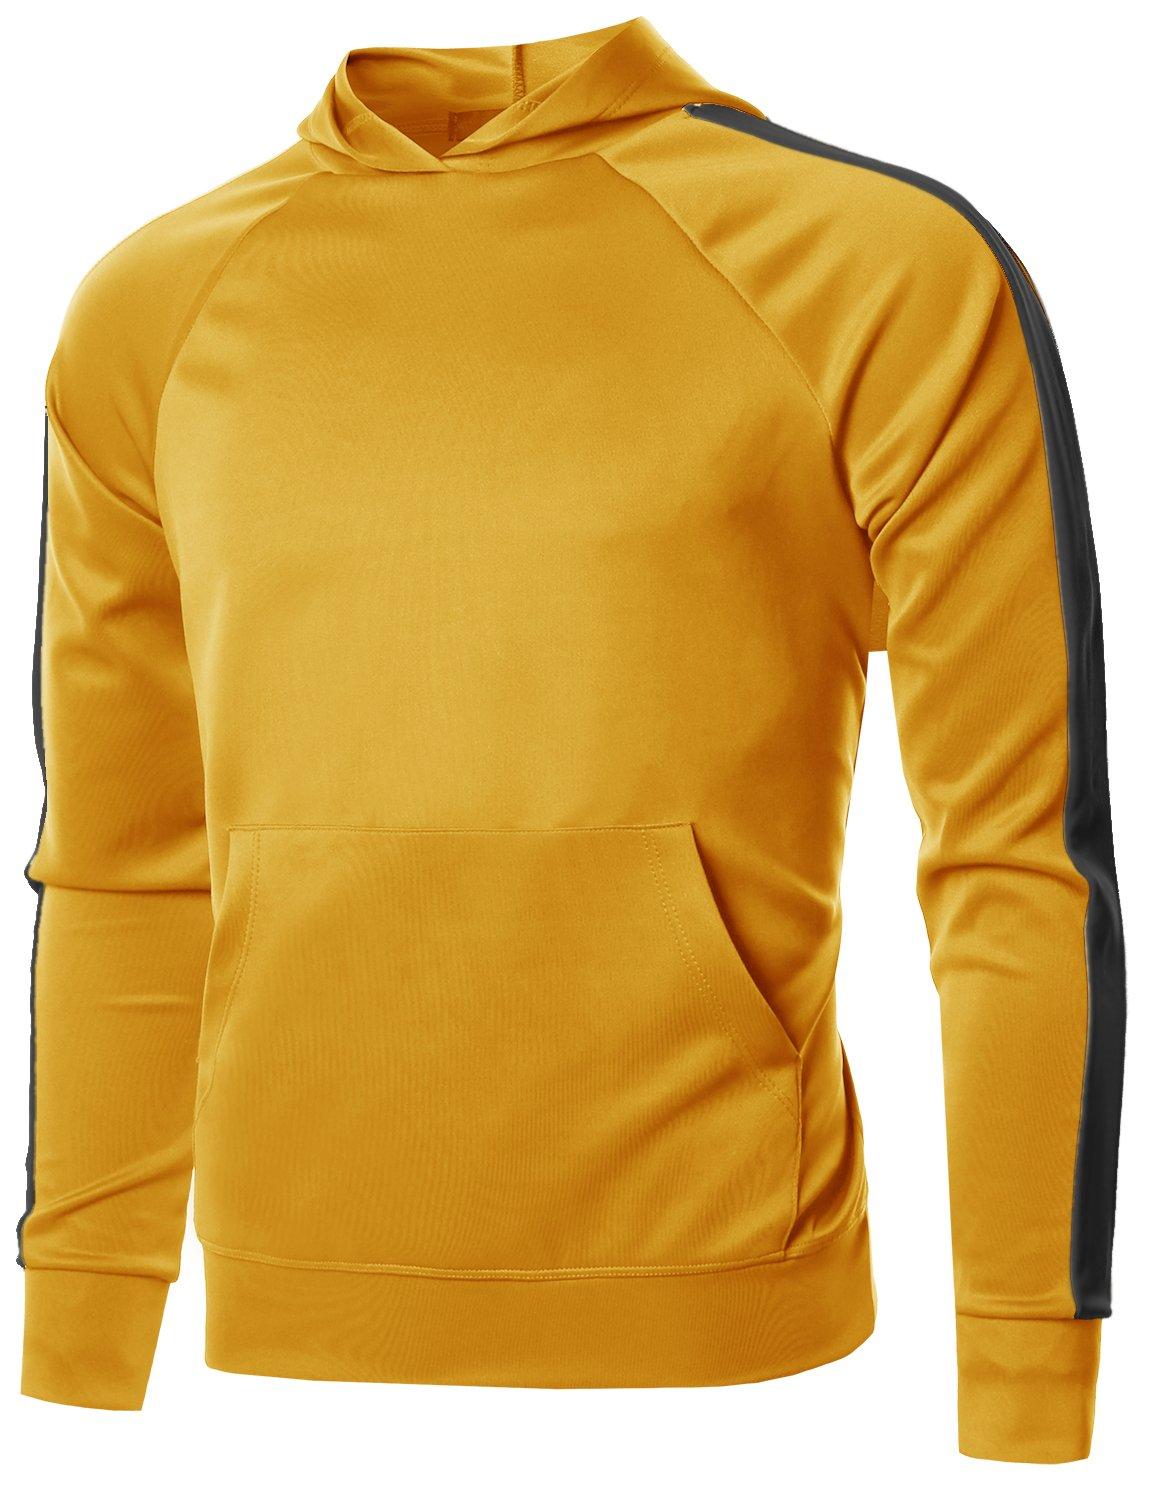 Style by William PANTS メンズ B07B8SXWH7 X-Large|Fsmhdl0008 Yellow Black Fsmhdl0008 Yellow Black X-Large